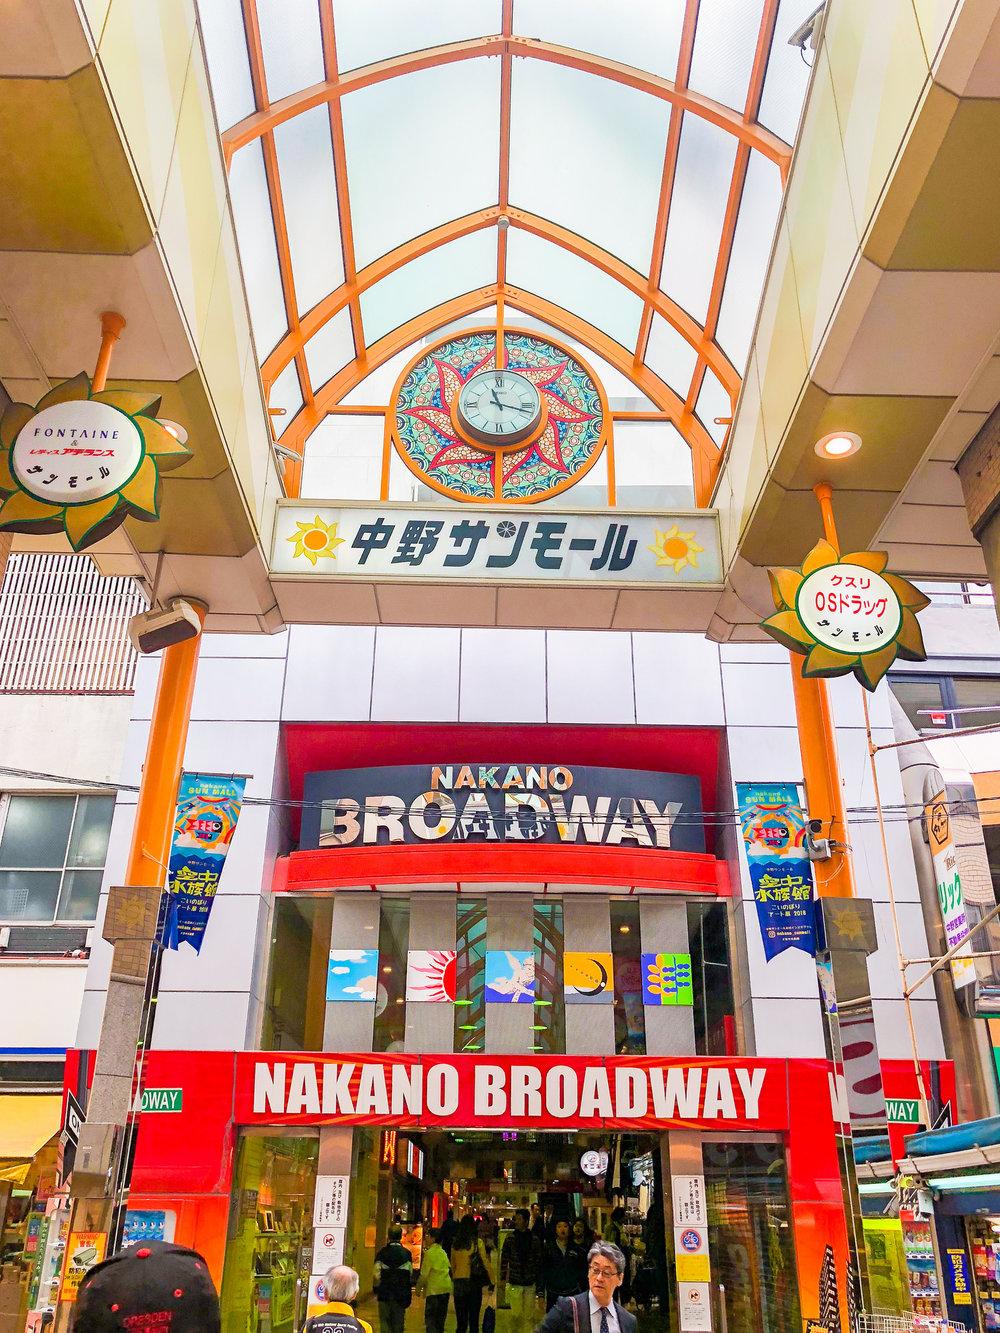 41014617845_51275fc3b8_k.jpgThe Ultimate Neighborhood Guide to Tokyo's Electric Otaku District, Nakano